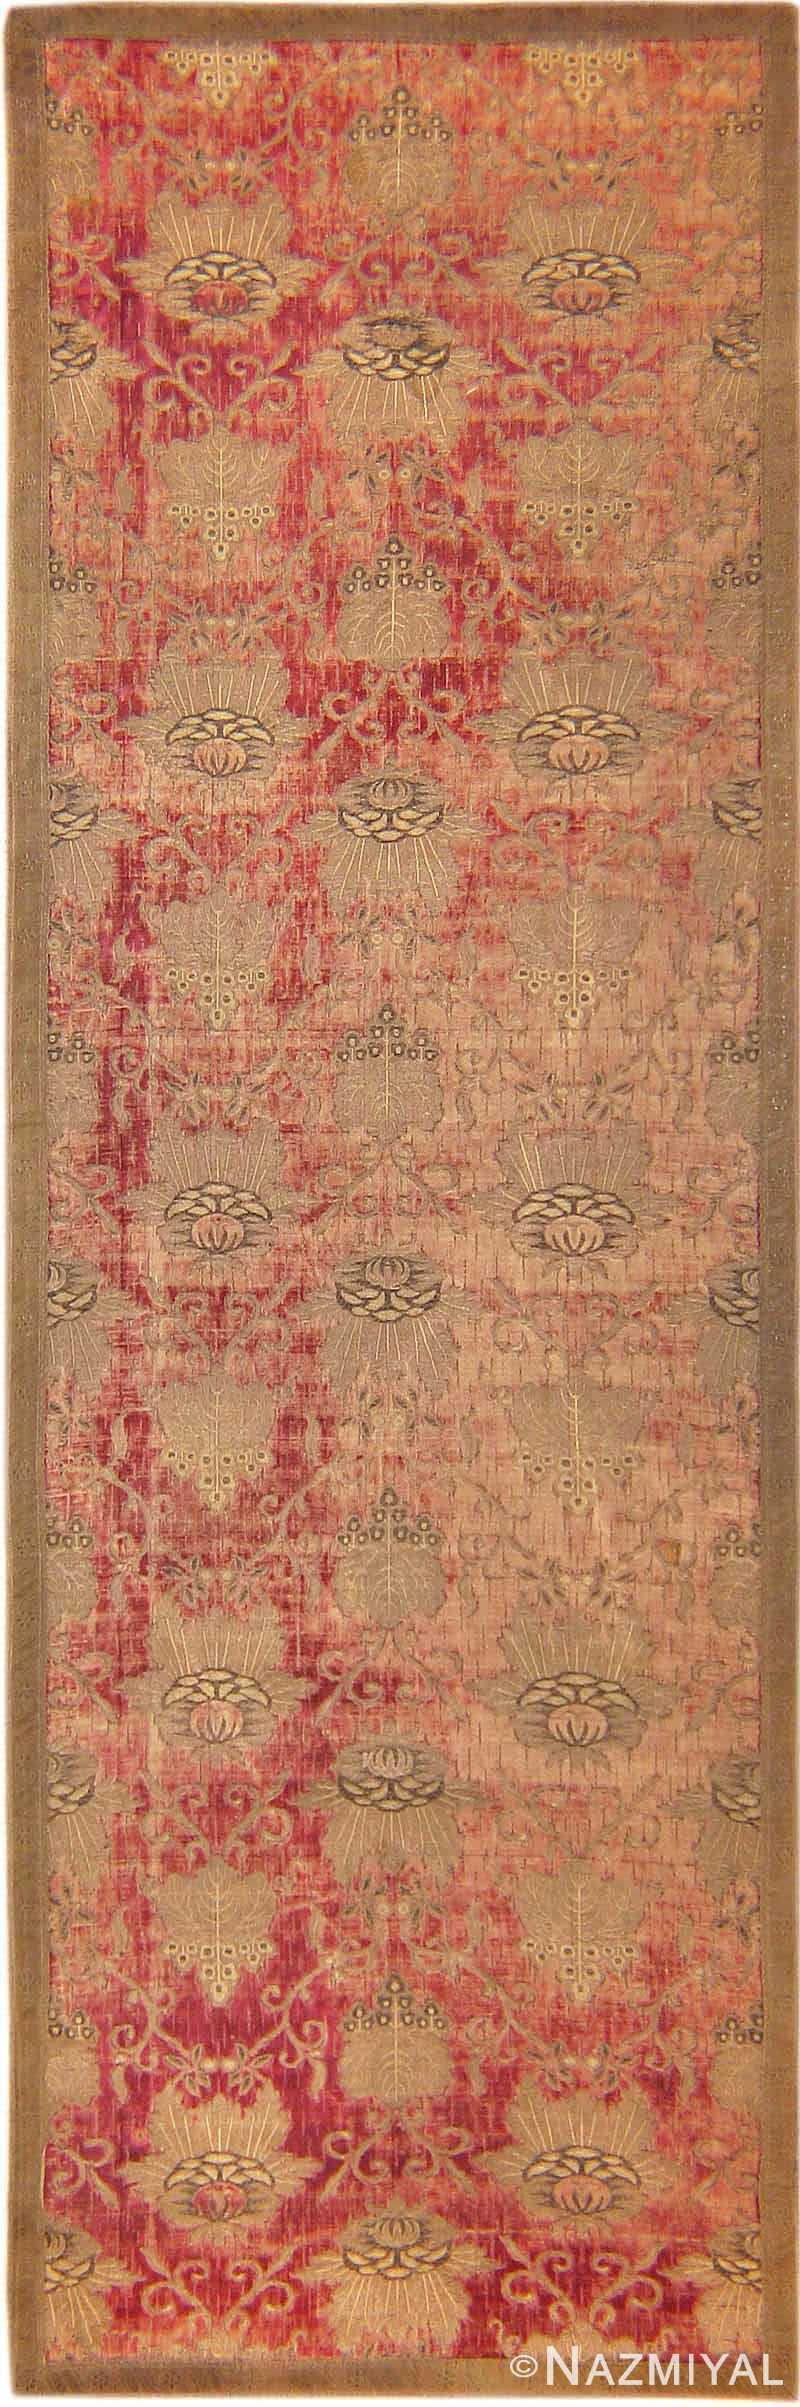 Antique Velvet Italian Textile 41961 Nazmiyal